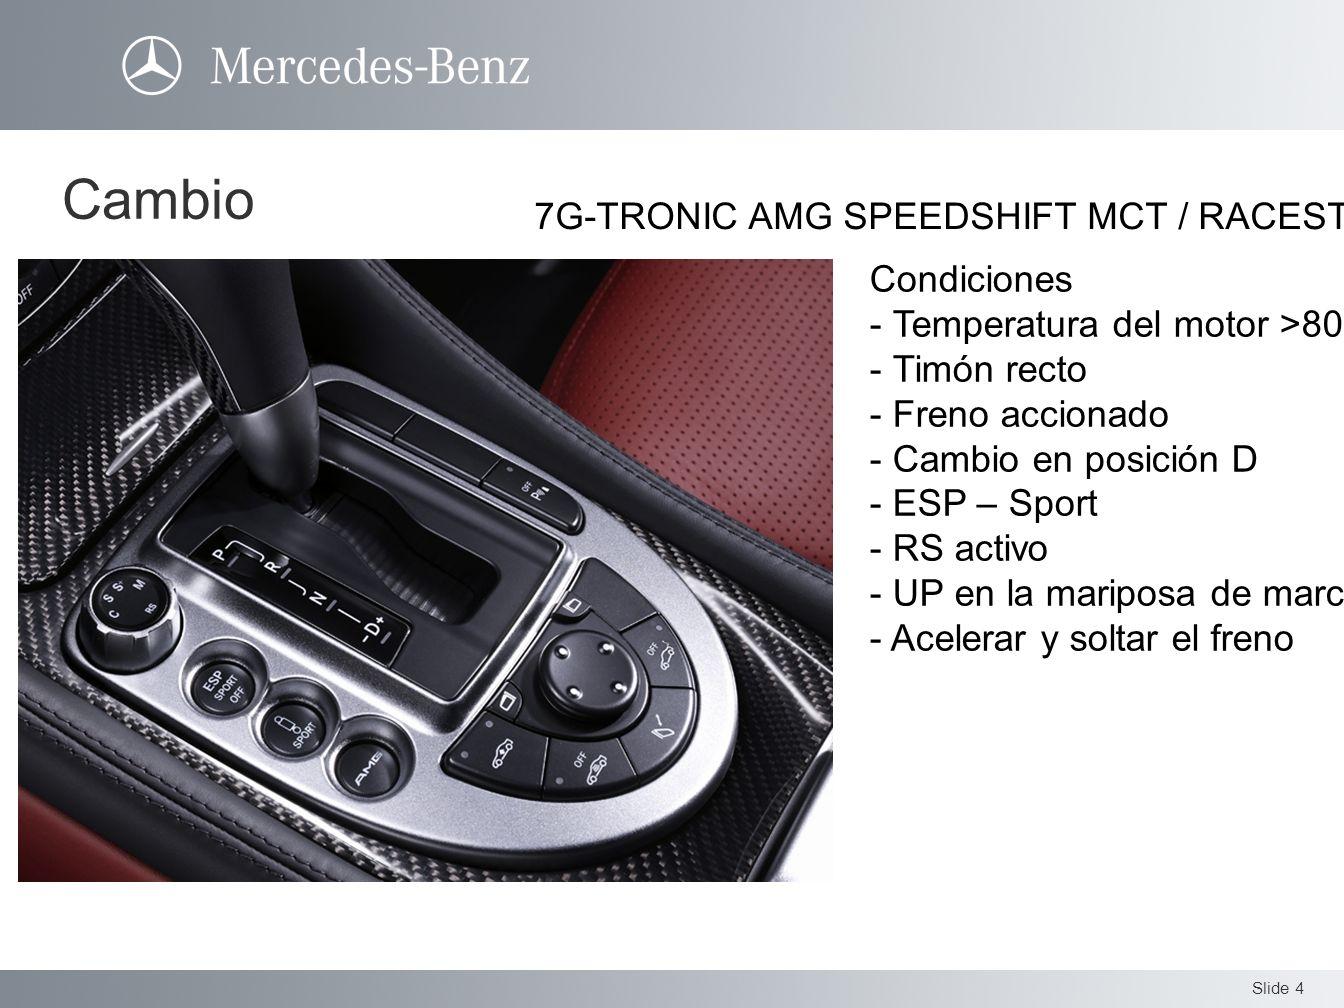 Cambio 7G-TRONIC AMG SPEEDSHIFT MCT / RACESTART Condiciones